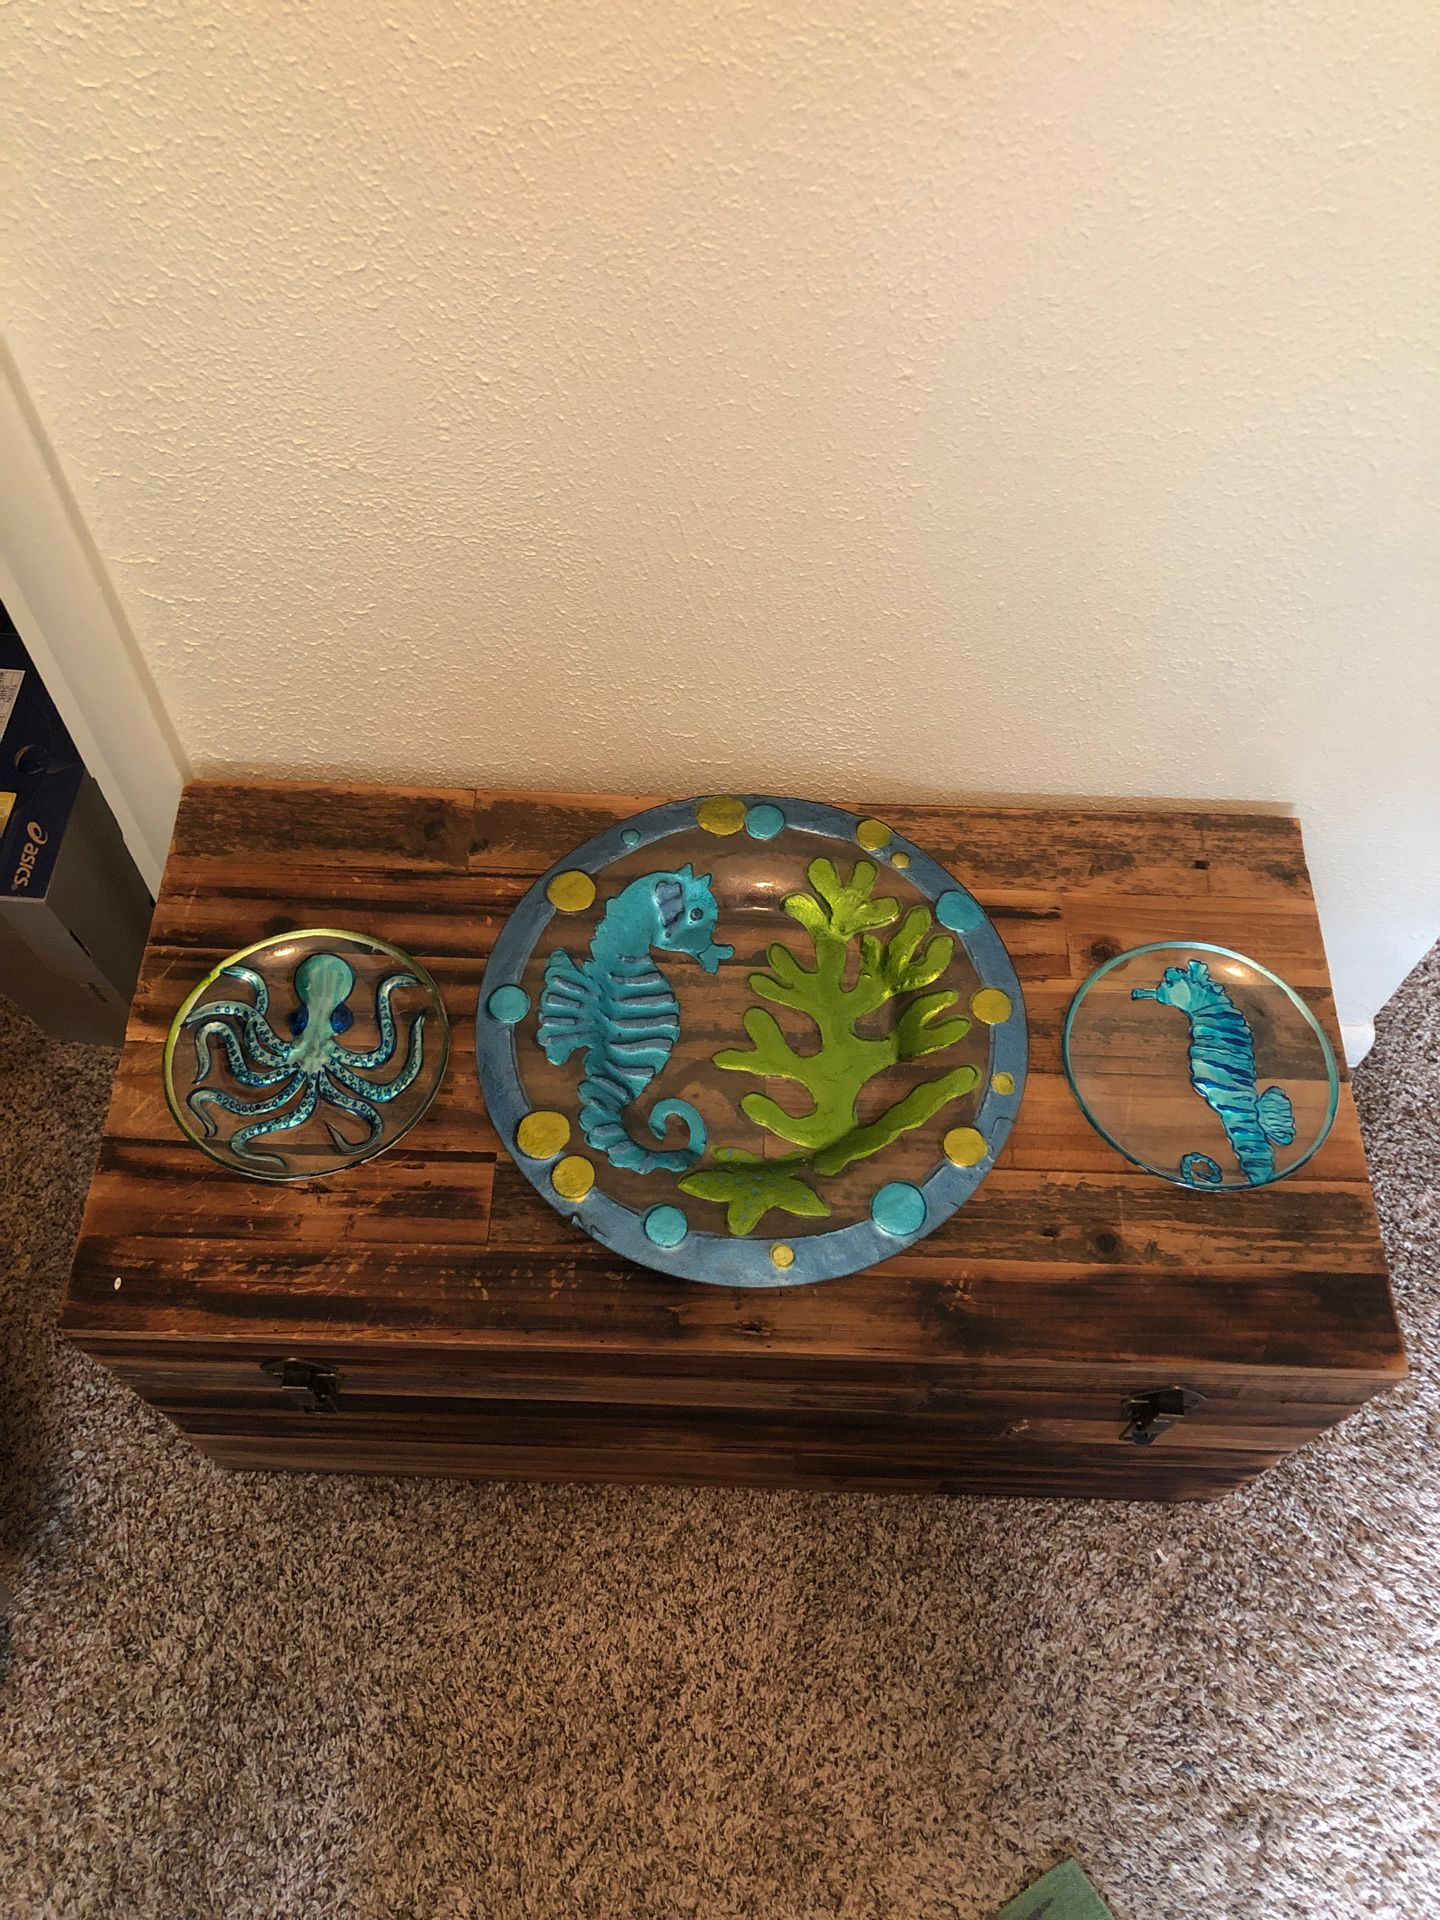 Decorative nautical plates